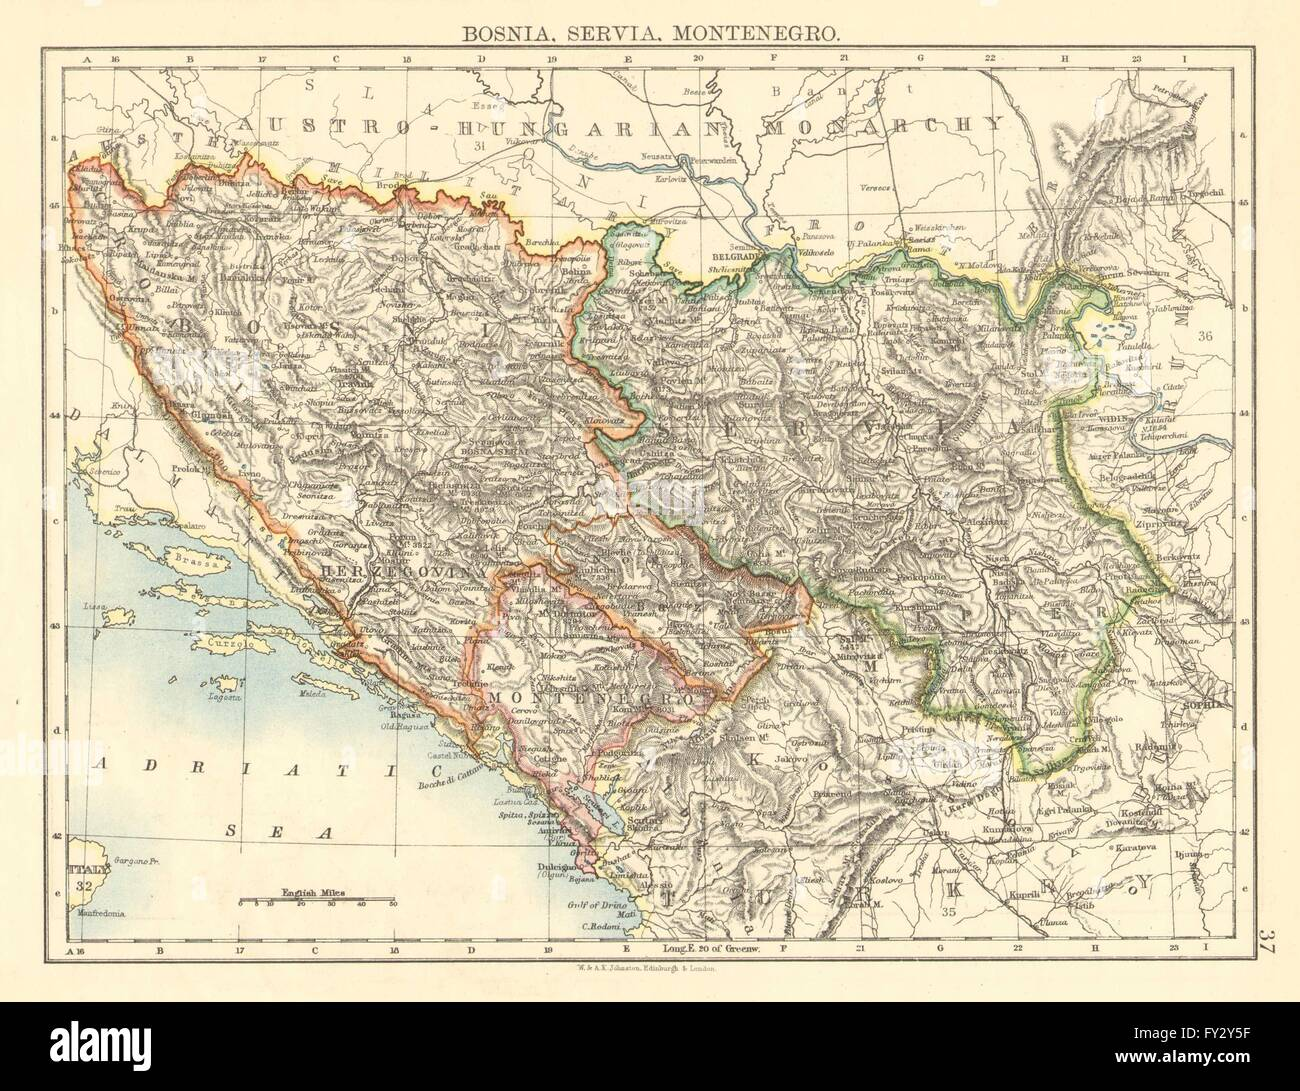 Bosnia servia montenegro balkans serbia croatia stock photo balkans serbia croatia herzegovinahnston 1899 map gumiabroncs Choice Image